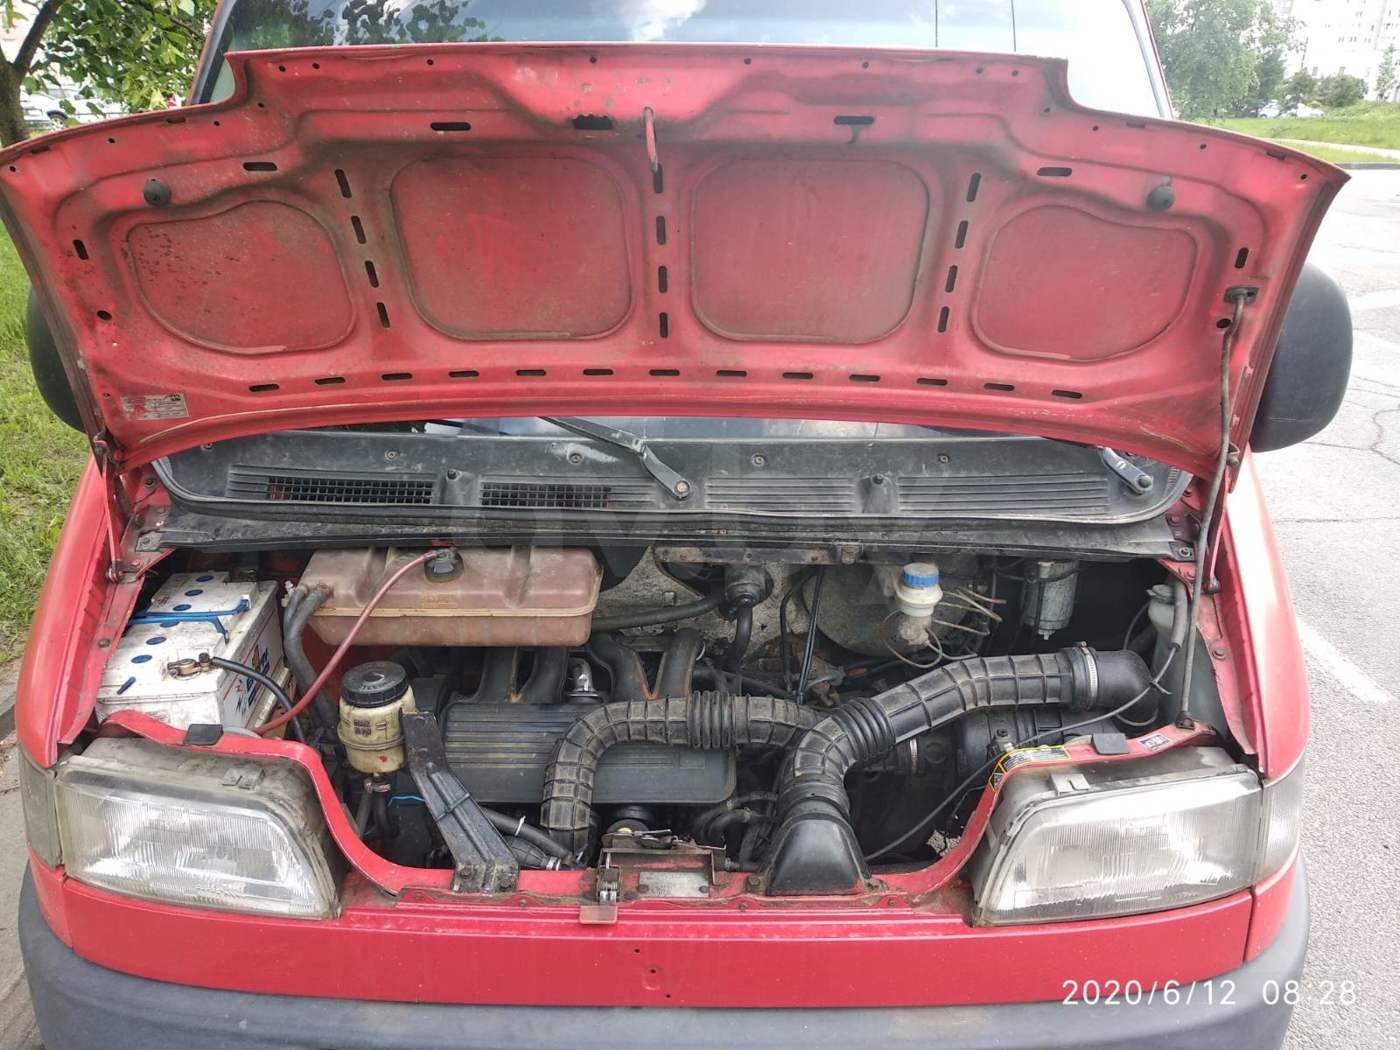 Fiat Ducato грузопассажирский, 2000 г.